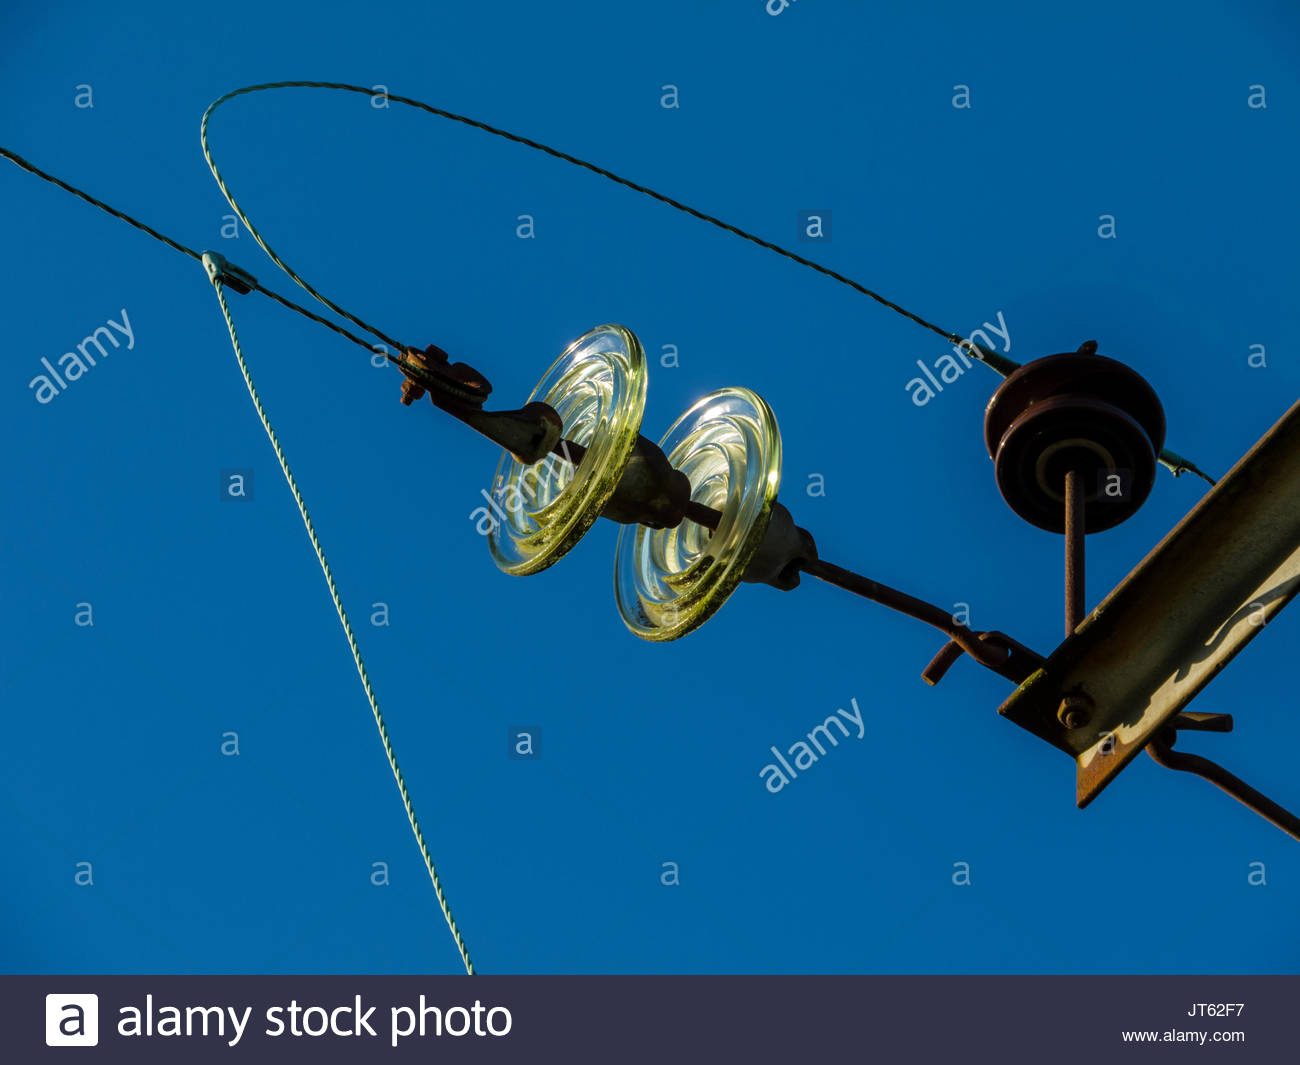 Hochspannungsleitung Isolatoren Stockbild